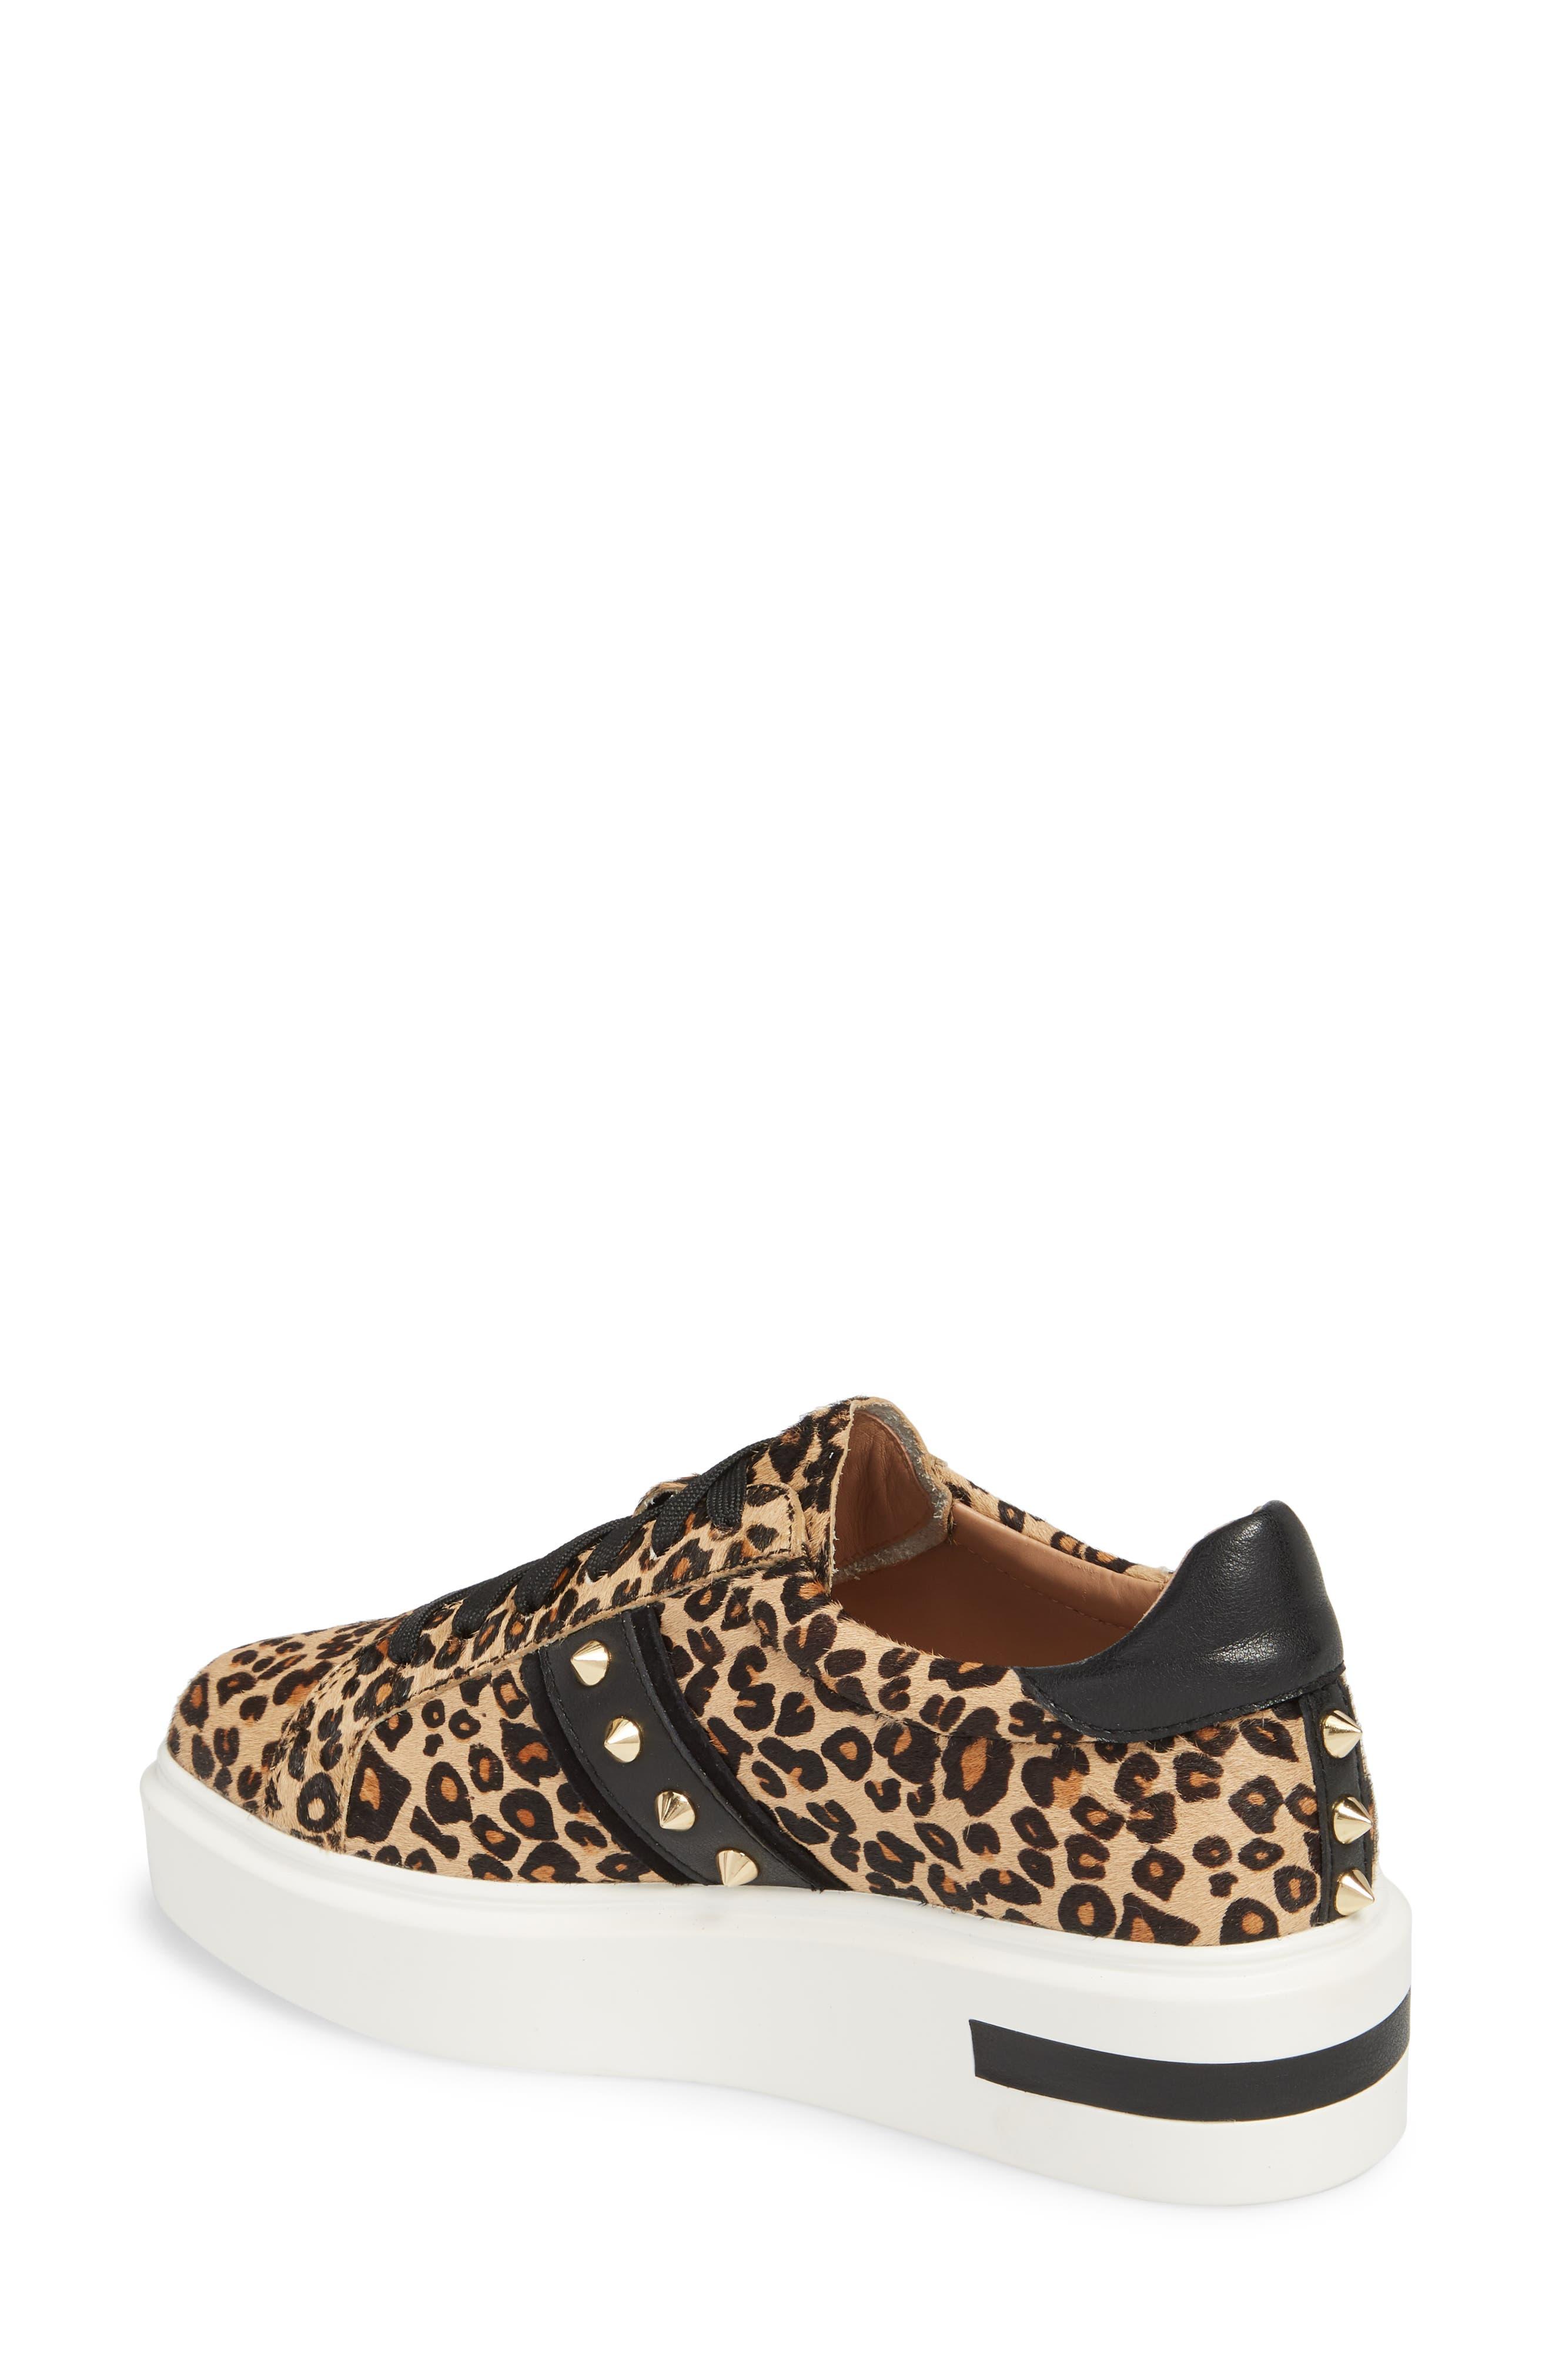 LINEA PAOLO,                             Knox II Platform Genuine Calf Hair Sneaker,                             Alternate thumbnail 2, color,                             LEOPARD PRINT HAIR CALF